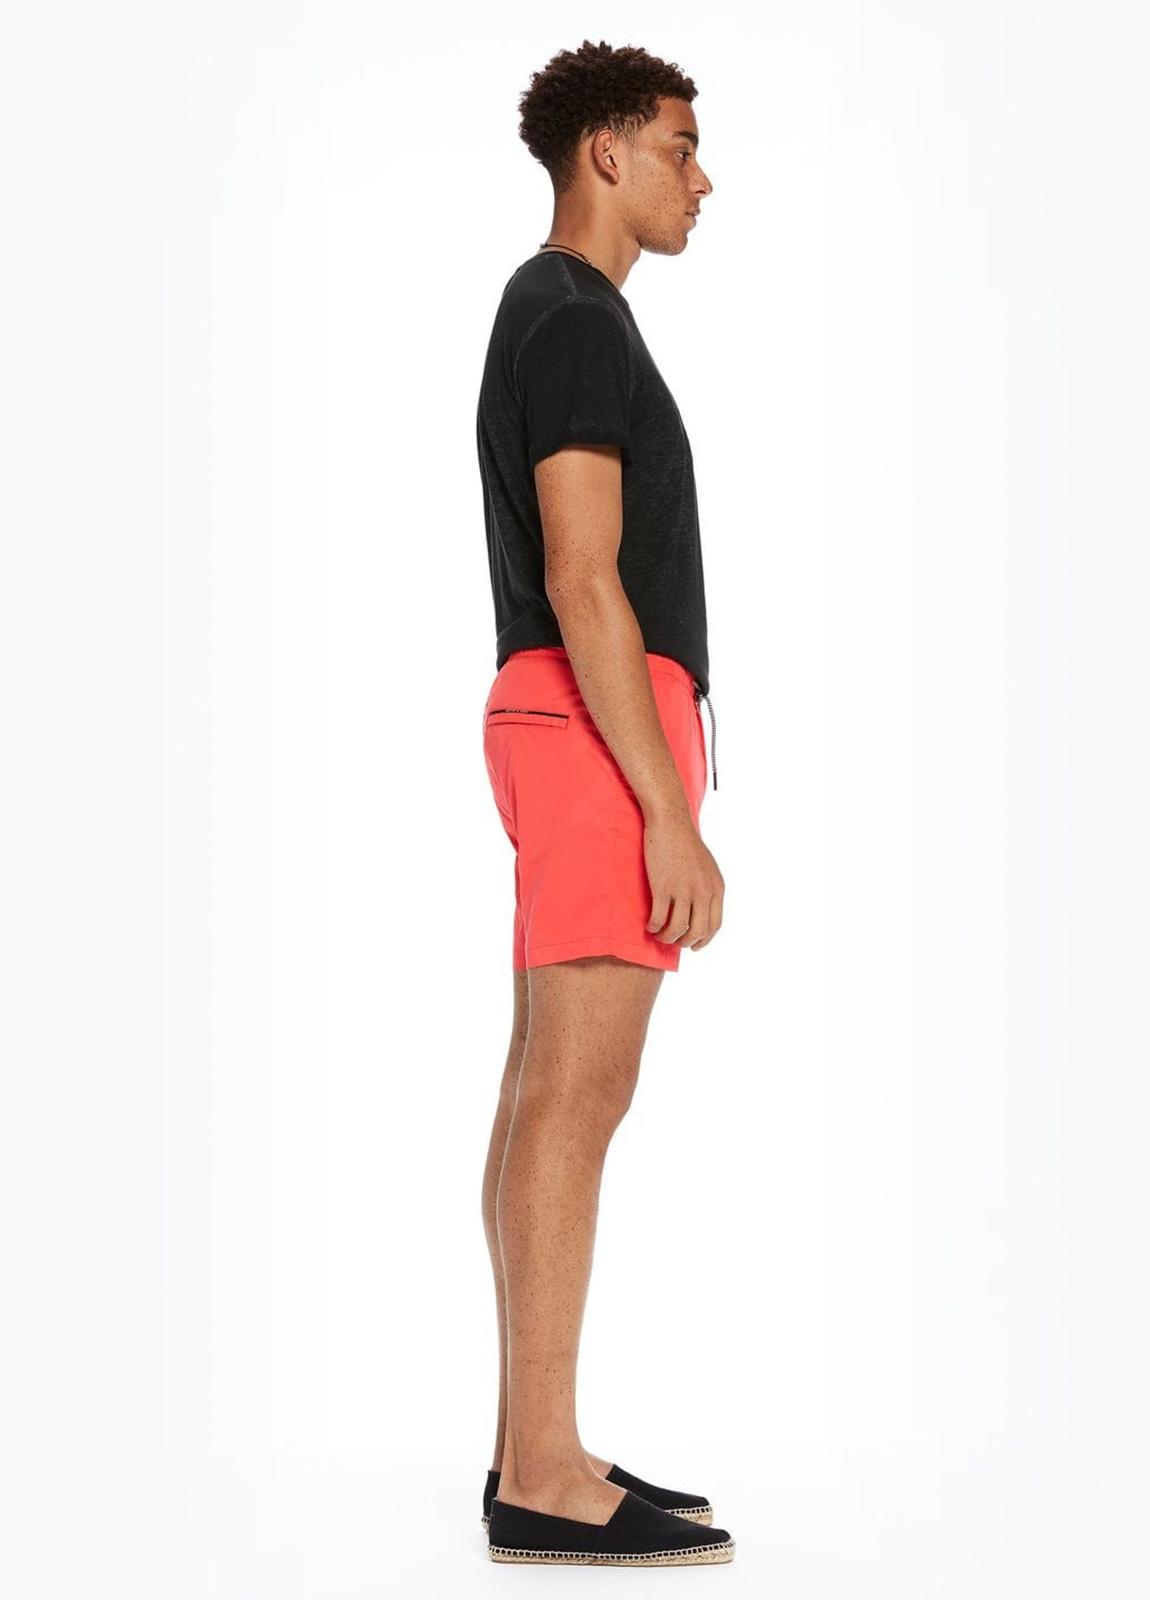 Bañador liso color coral con logo impreso. 100% Poliéster. - Ítem1